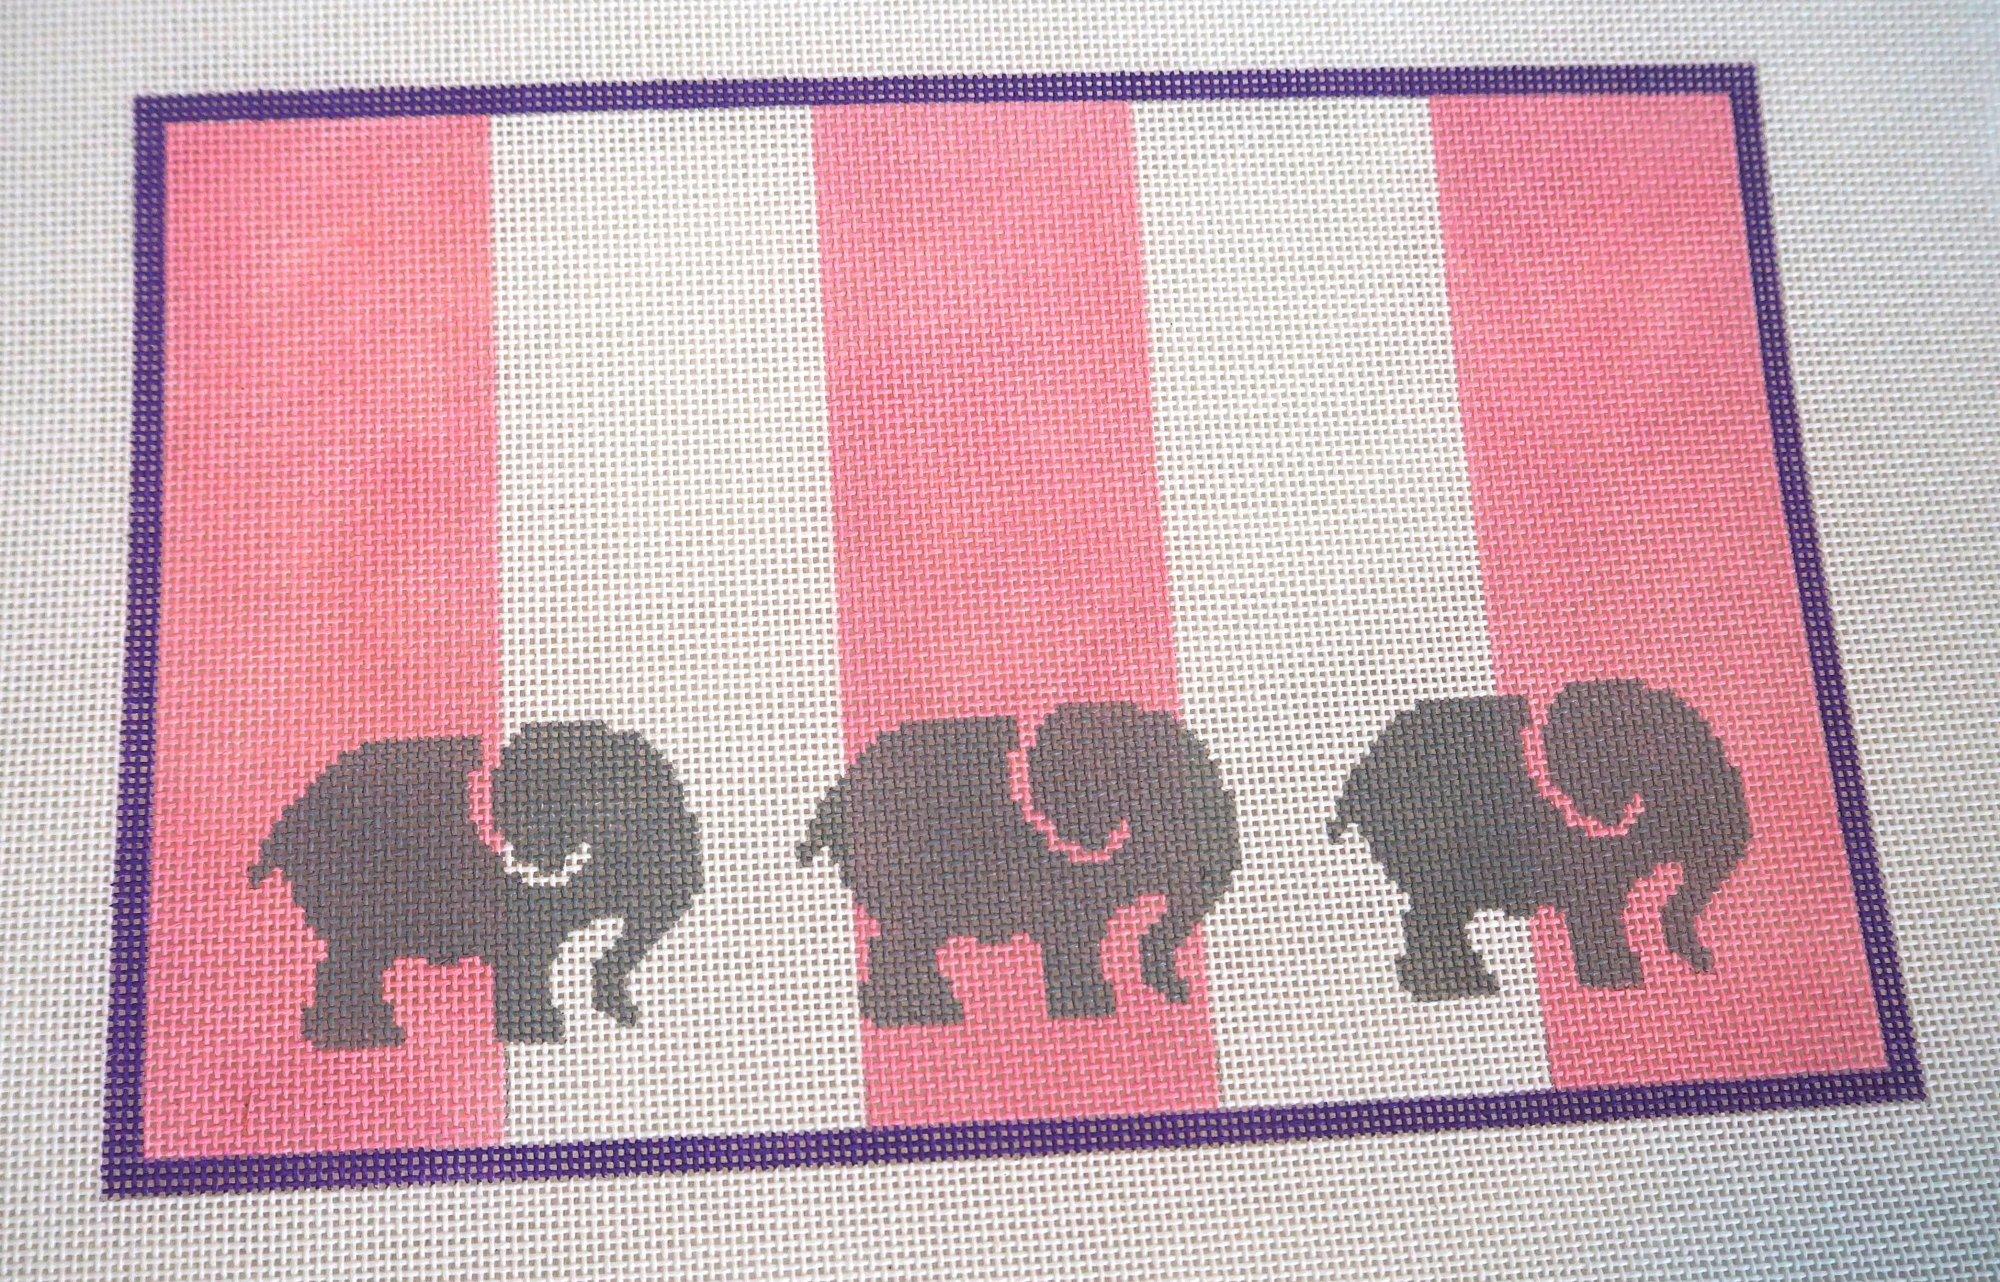 Elephant Sampler in Pink KKSG14